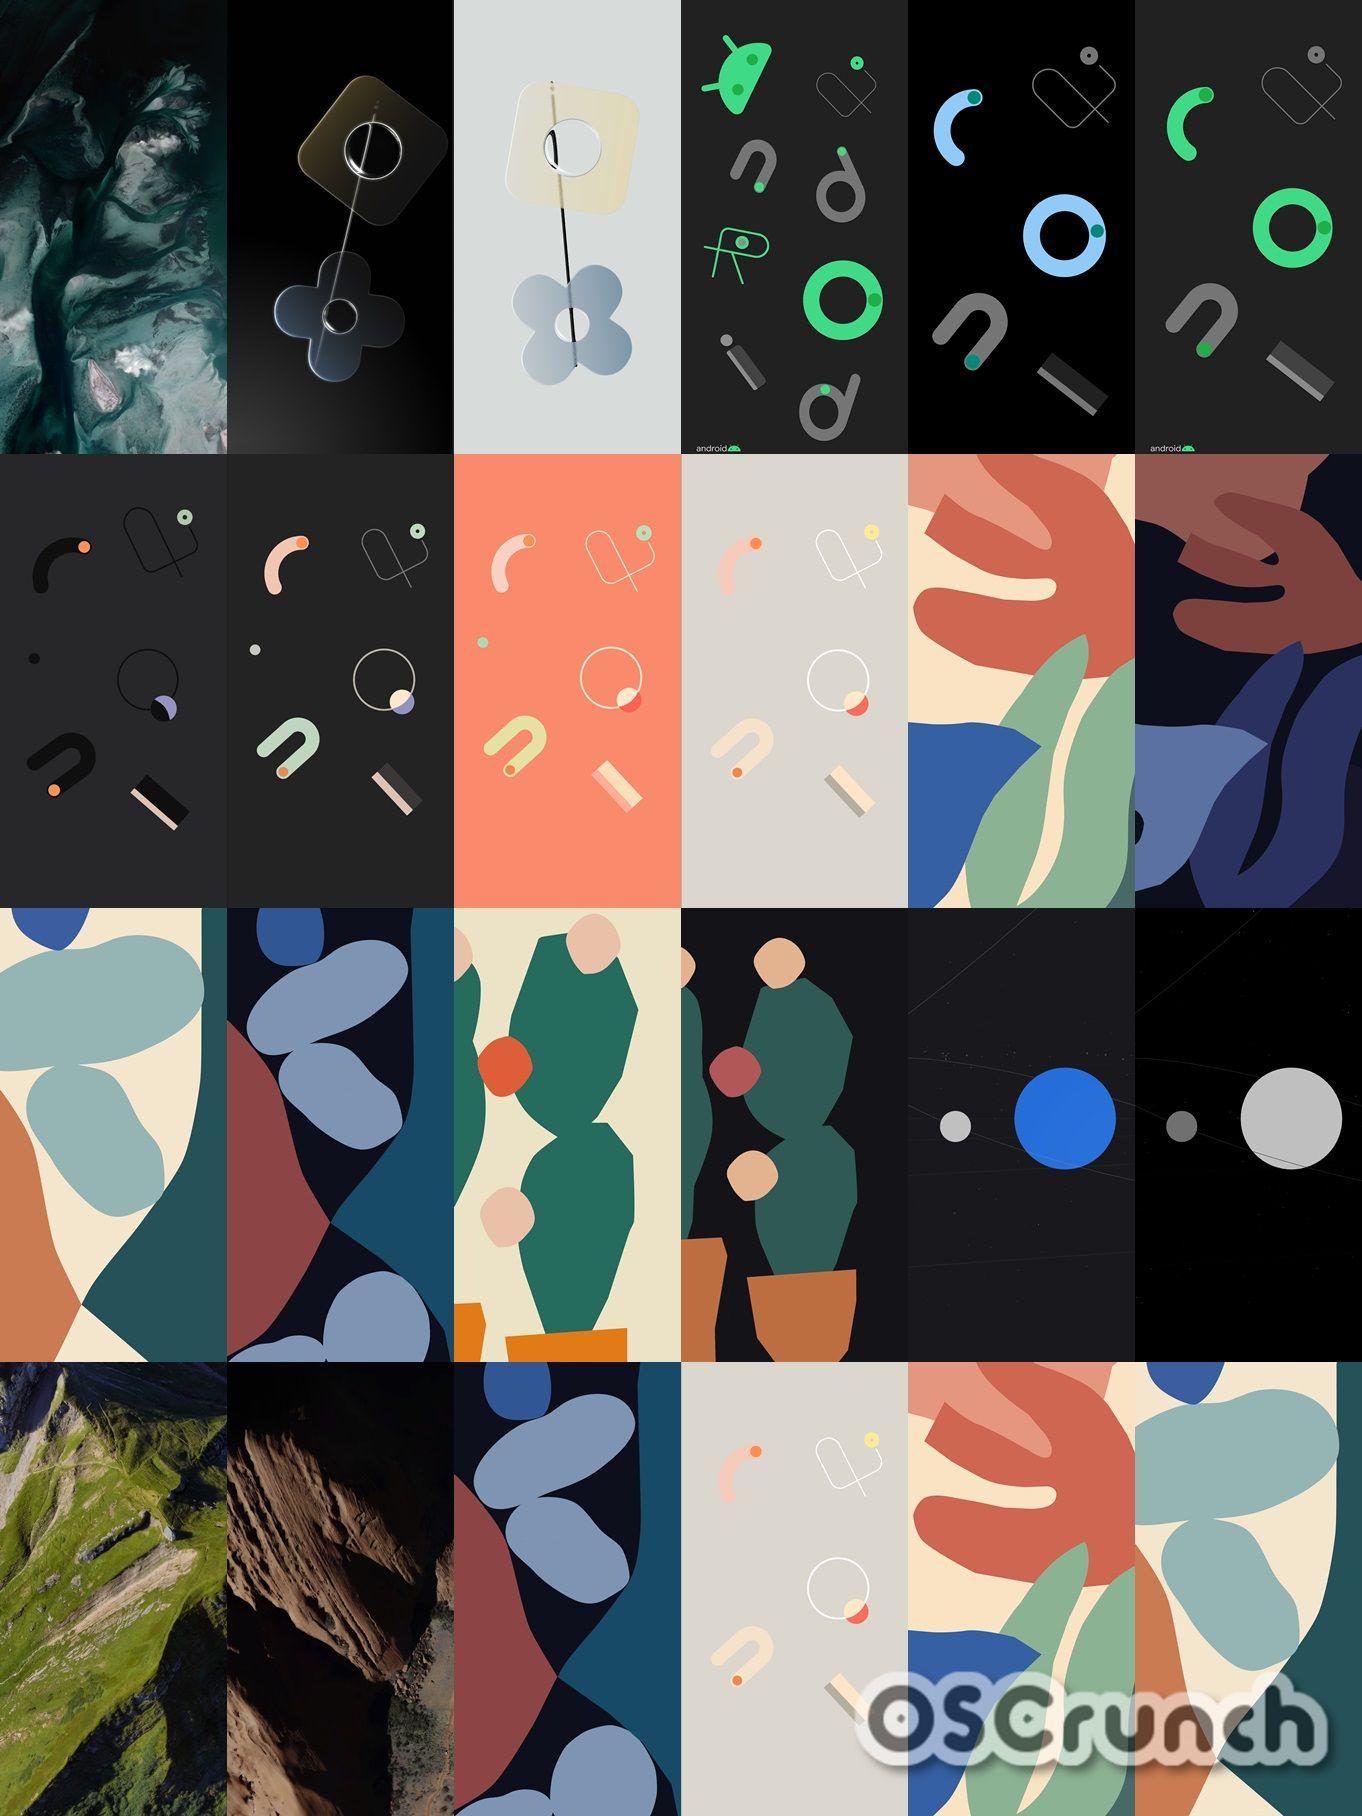 Download Google Pixel 4XL Stock Wallpapers & Live ...